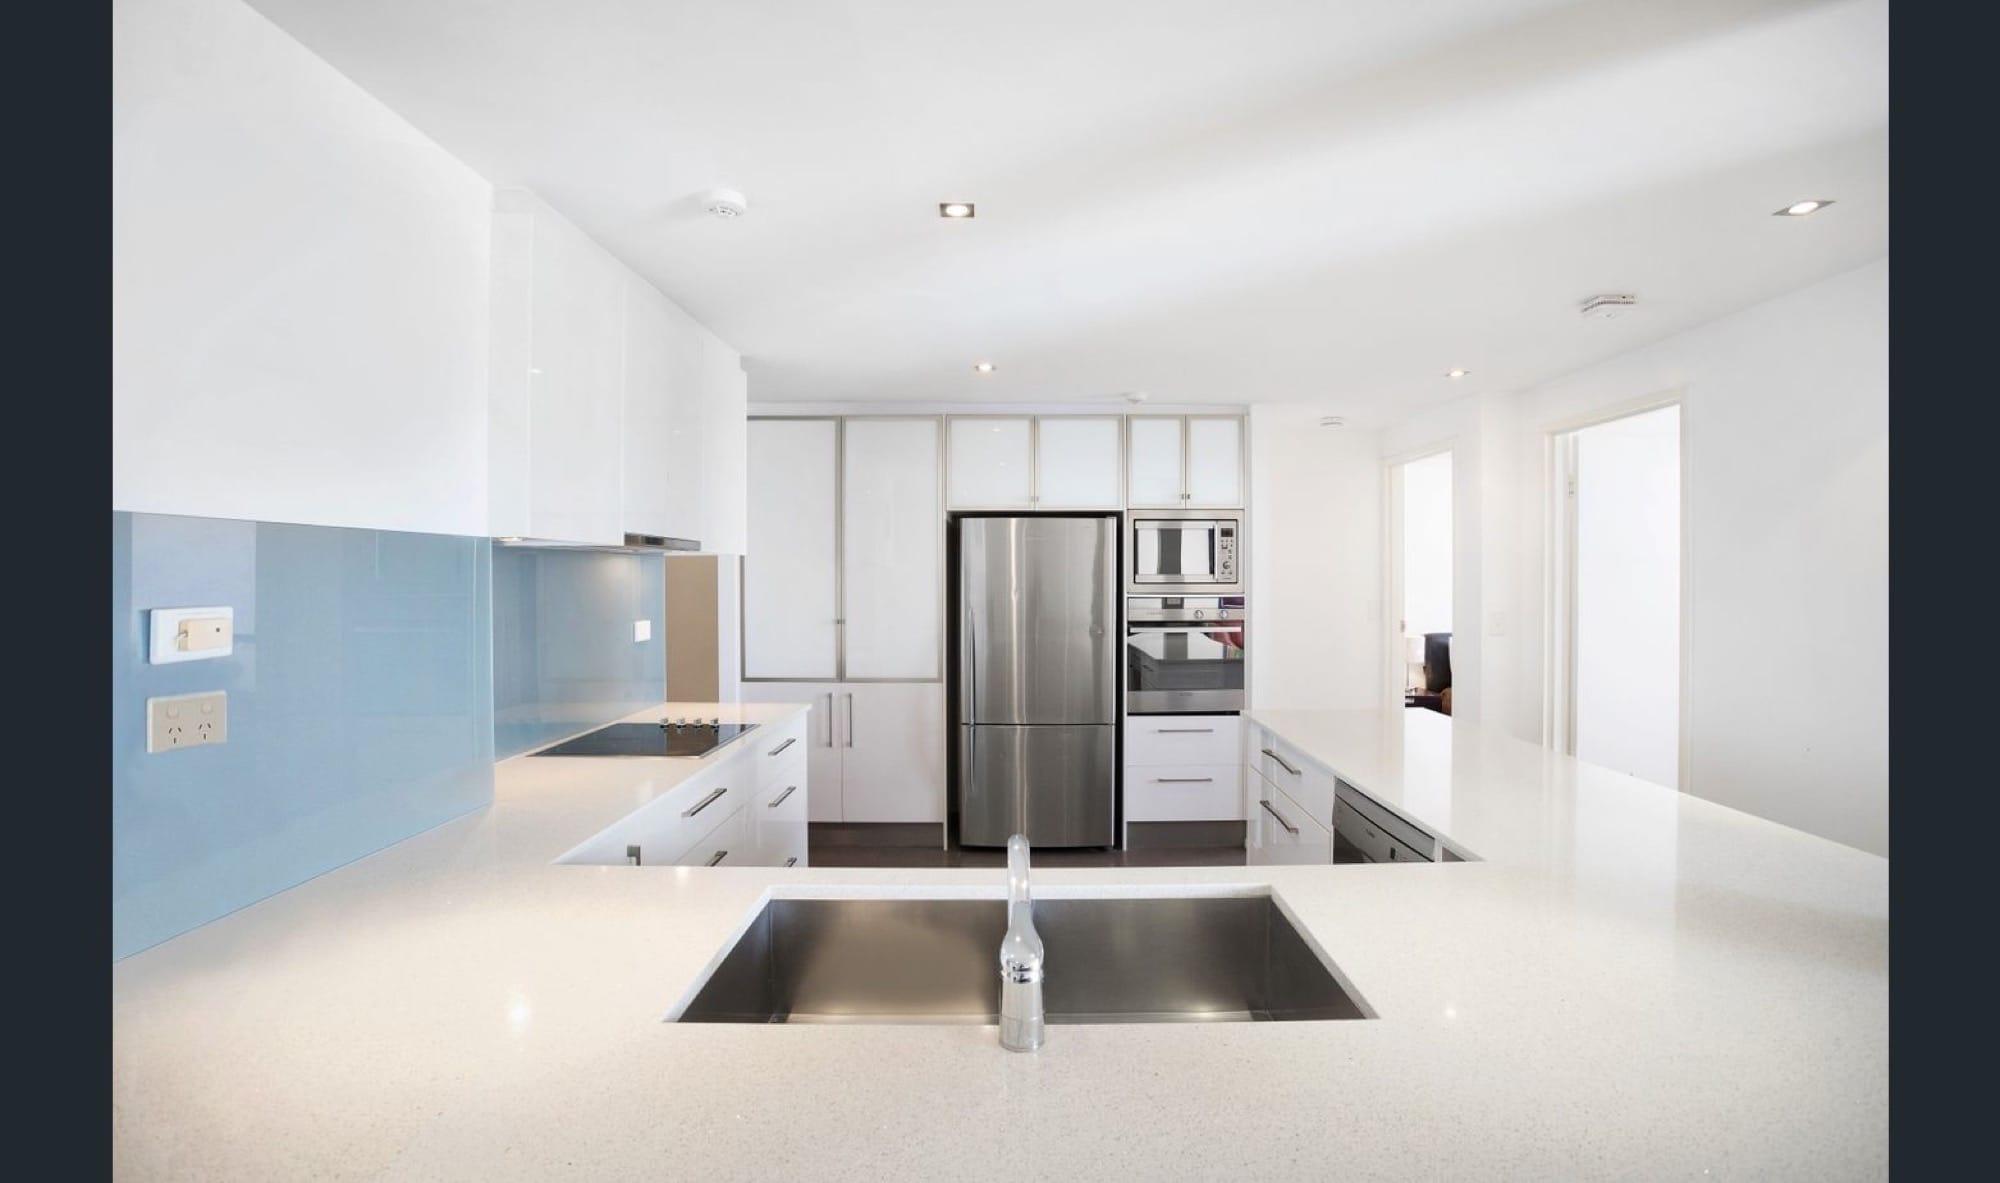 apartment-breakers-north-11d-9